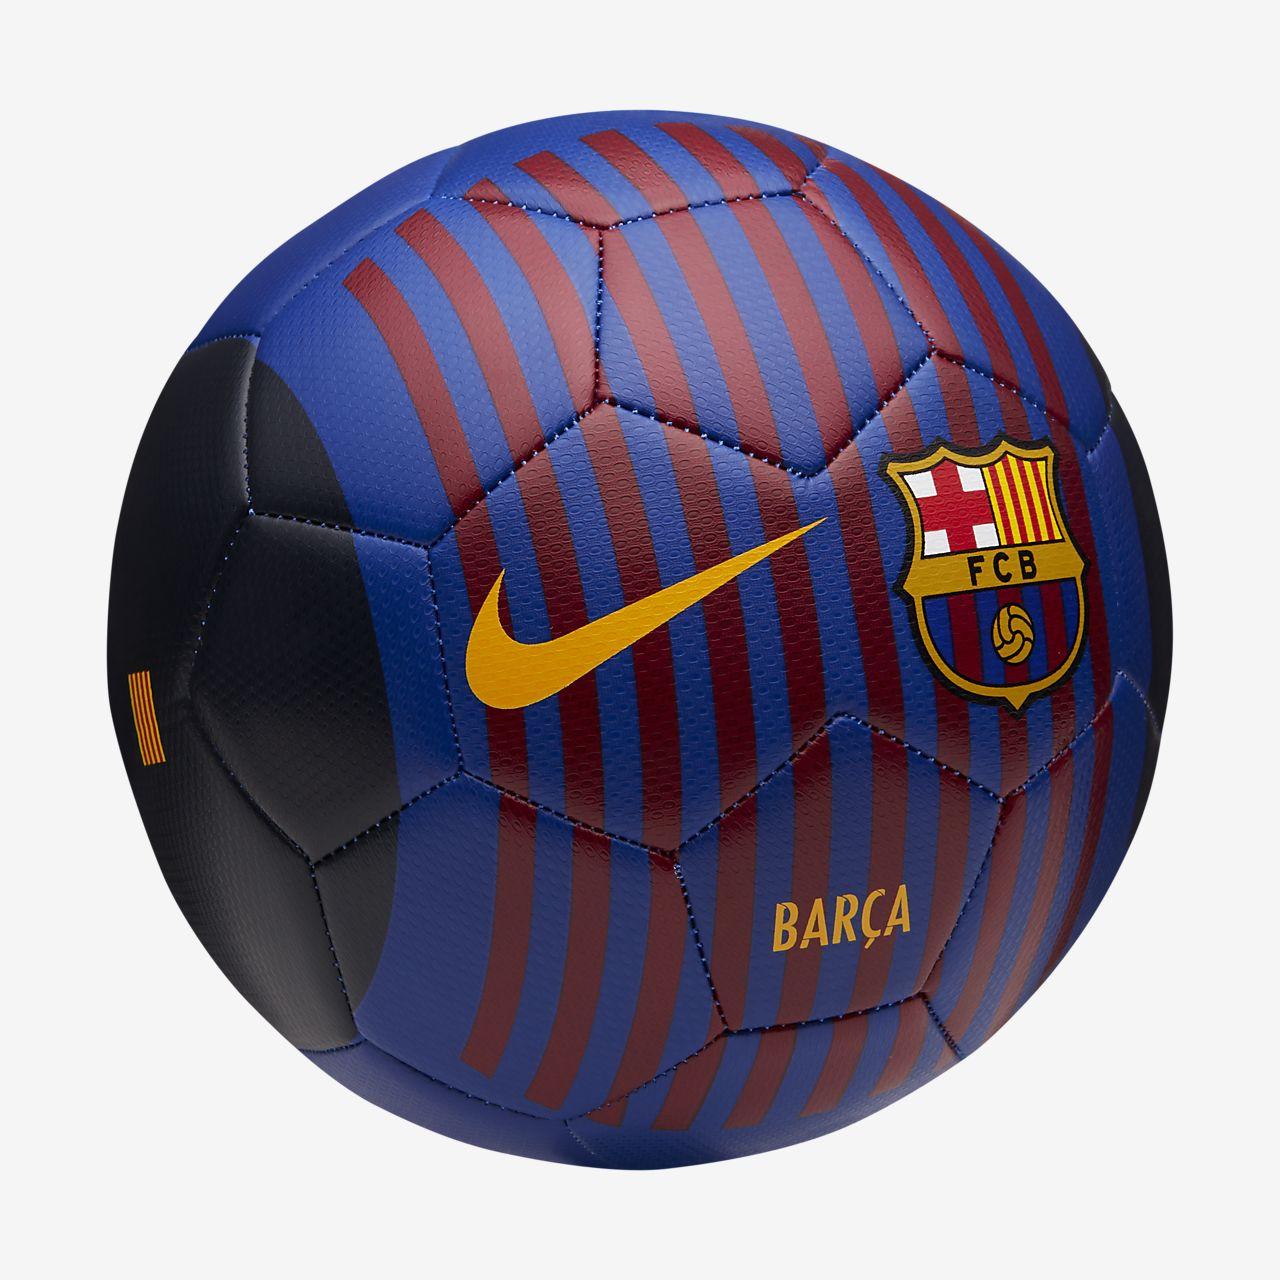 240478296f293 Balón de fútbol FC Barcelona Prestige. Nike.com MX